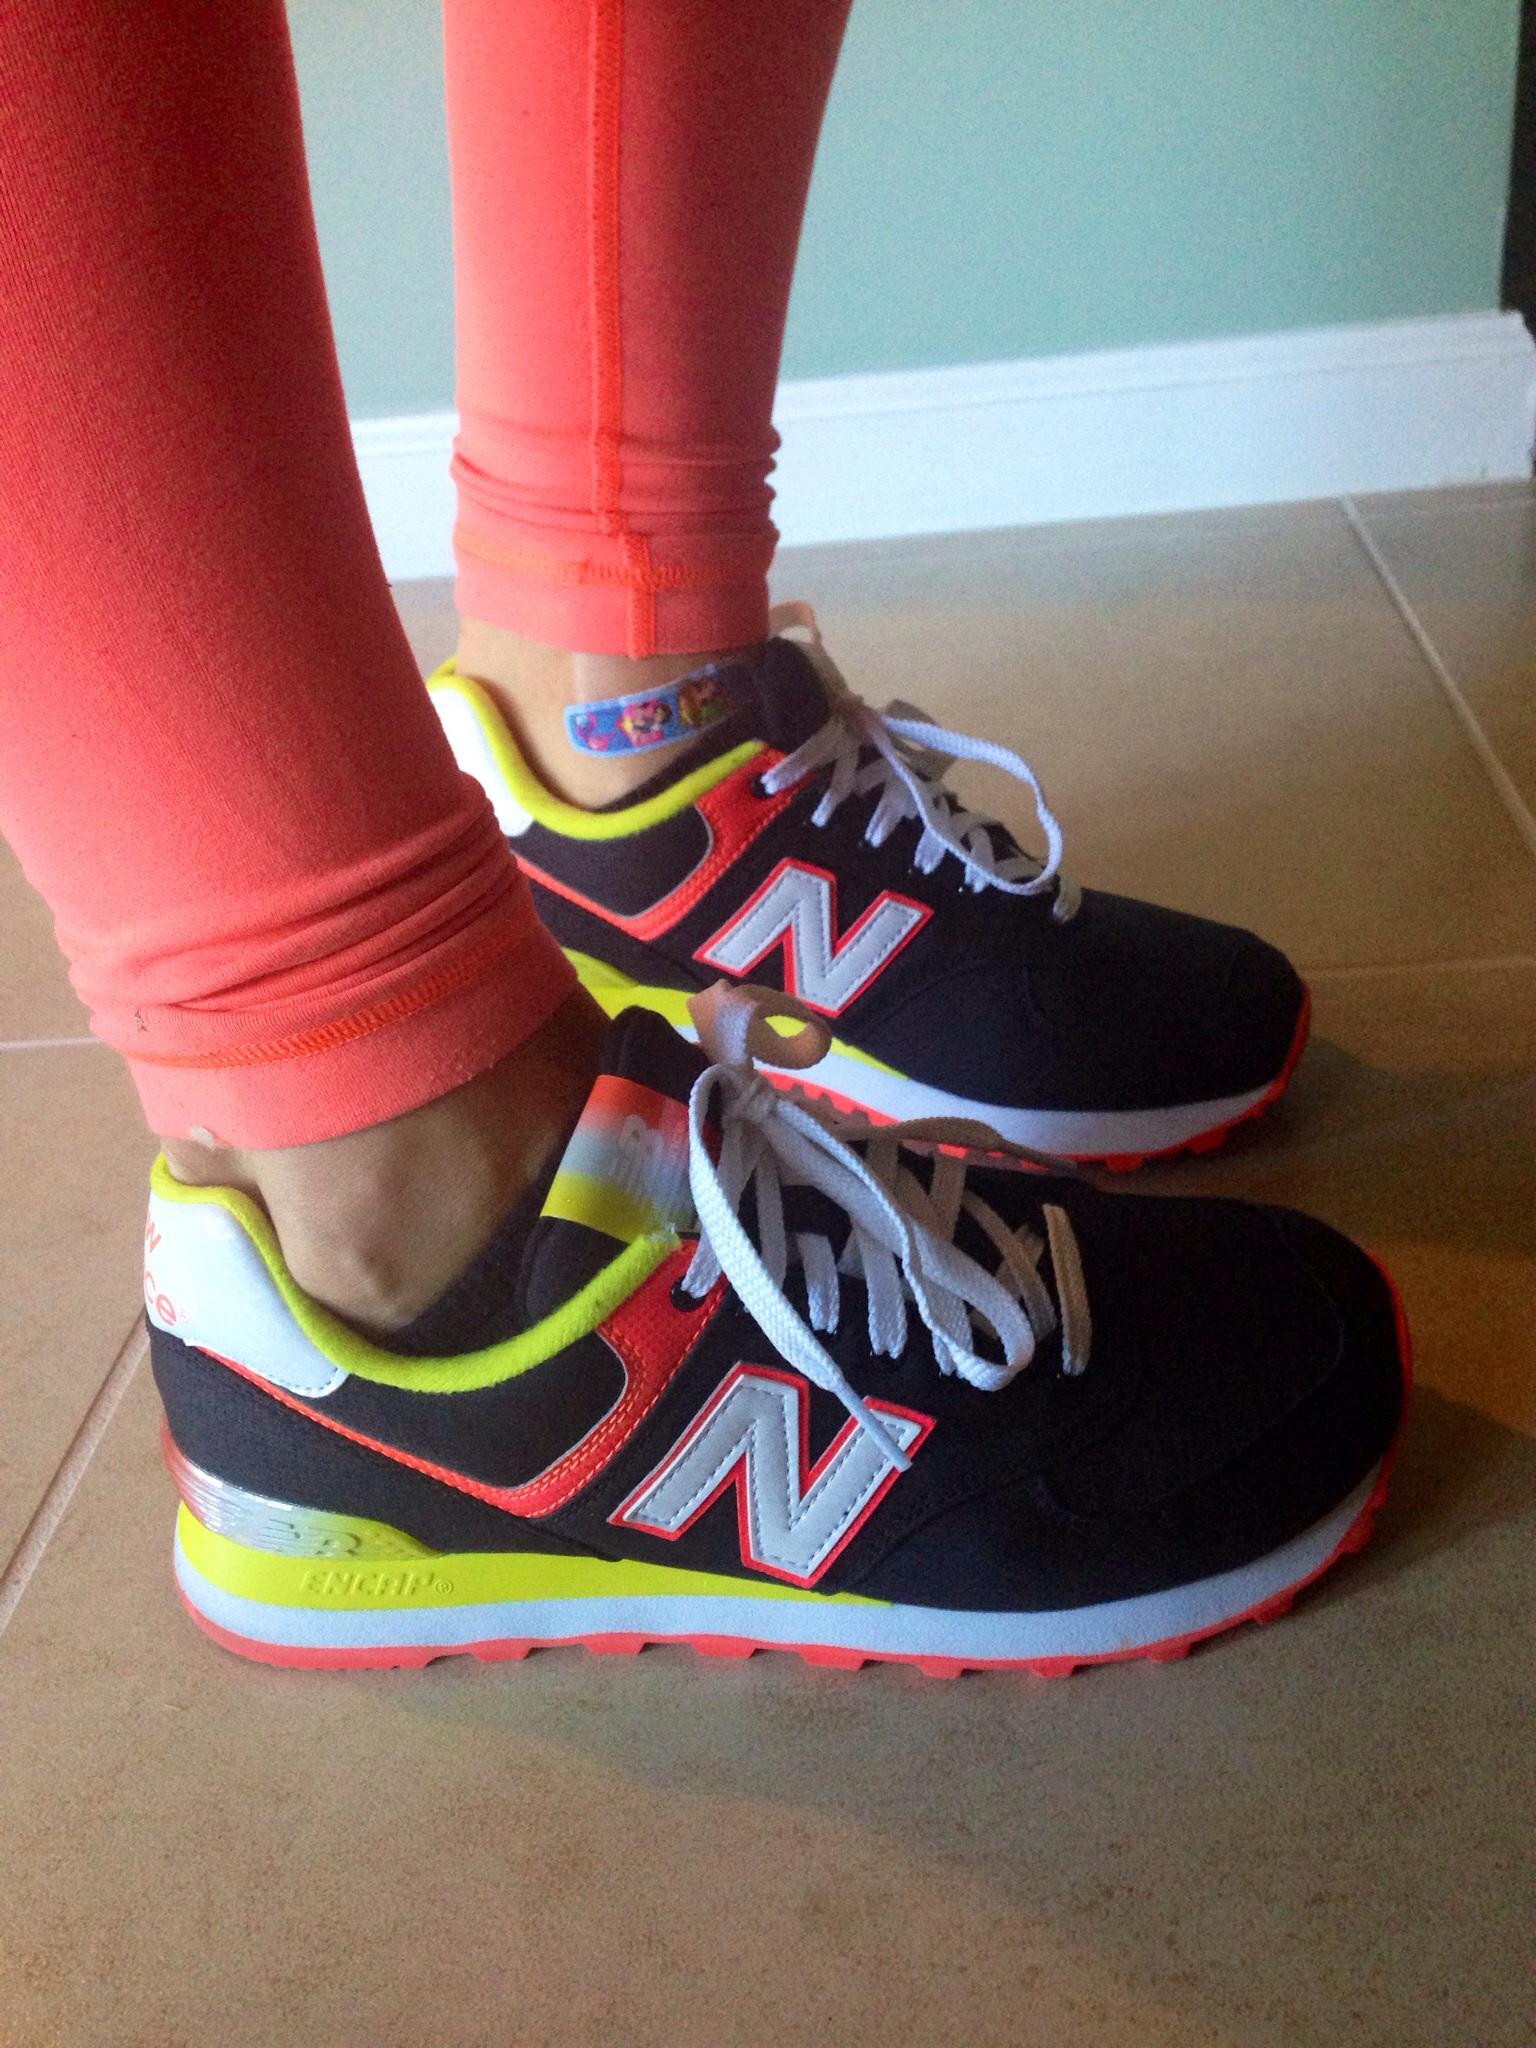 New Balance kicks